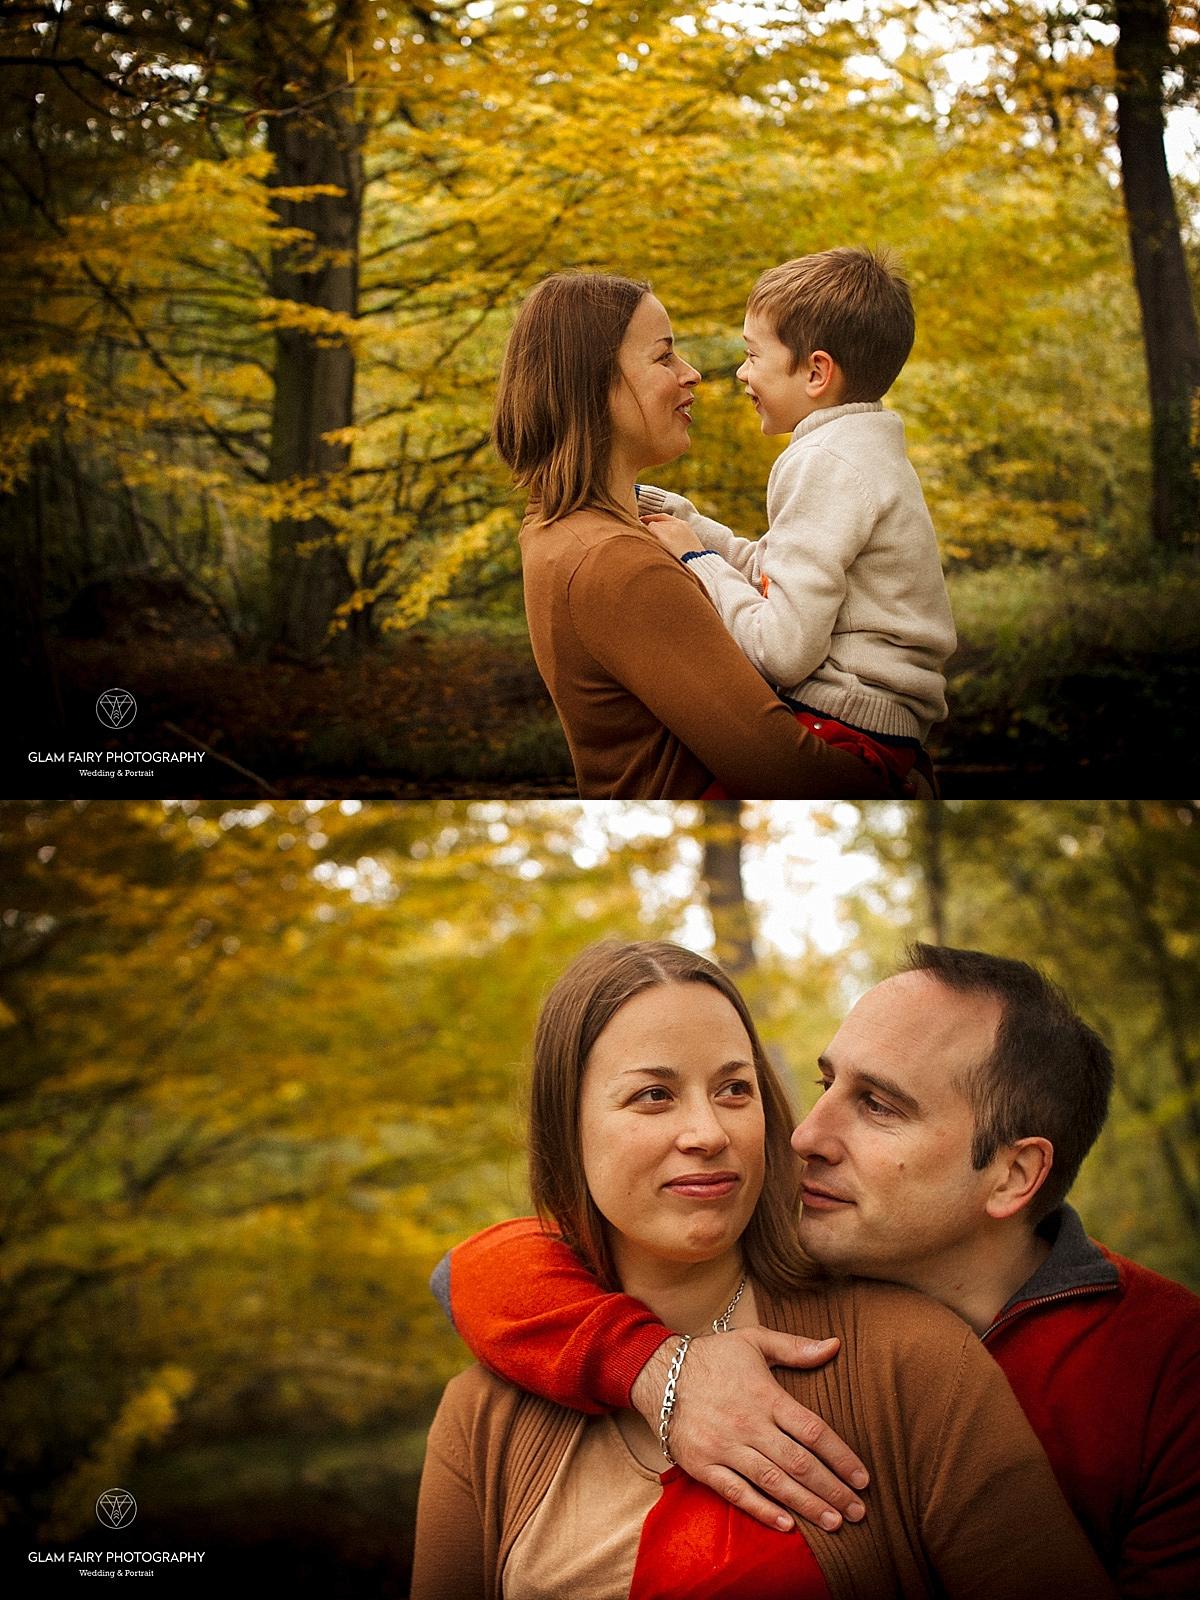 GlamFairyPhotography-mini-session-en-famille-a-vincennes-cecile_0007